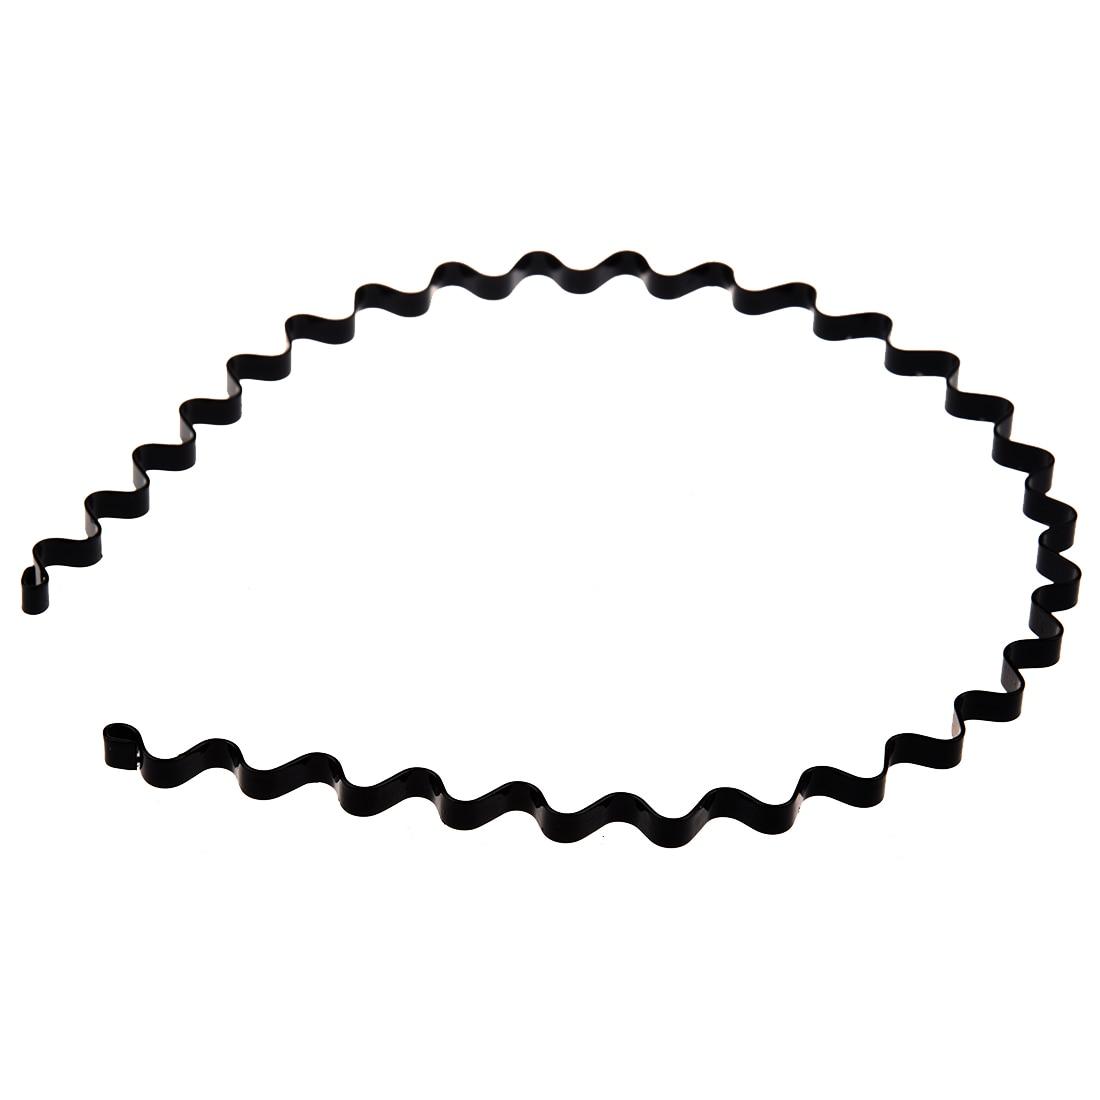 BFYL 5 pcs hairband headband UNISEX Sport Made of metal for 5mm Black